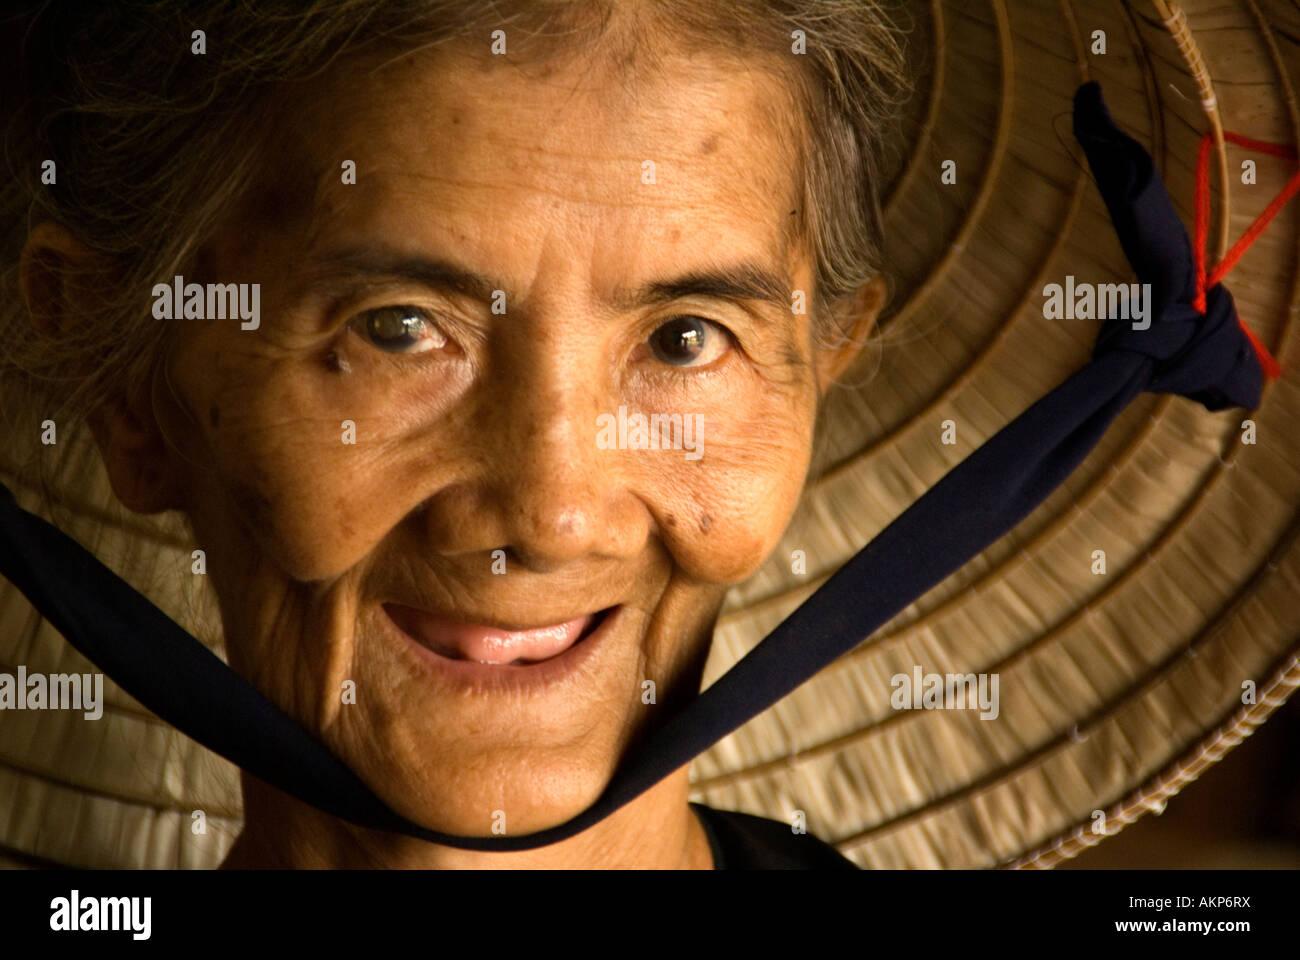 Elderly Vietnamese woman in Mekong River Delta - Stock Image